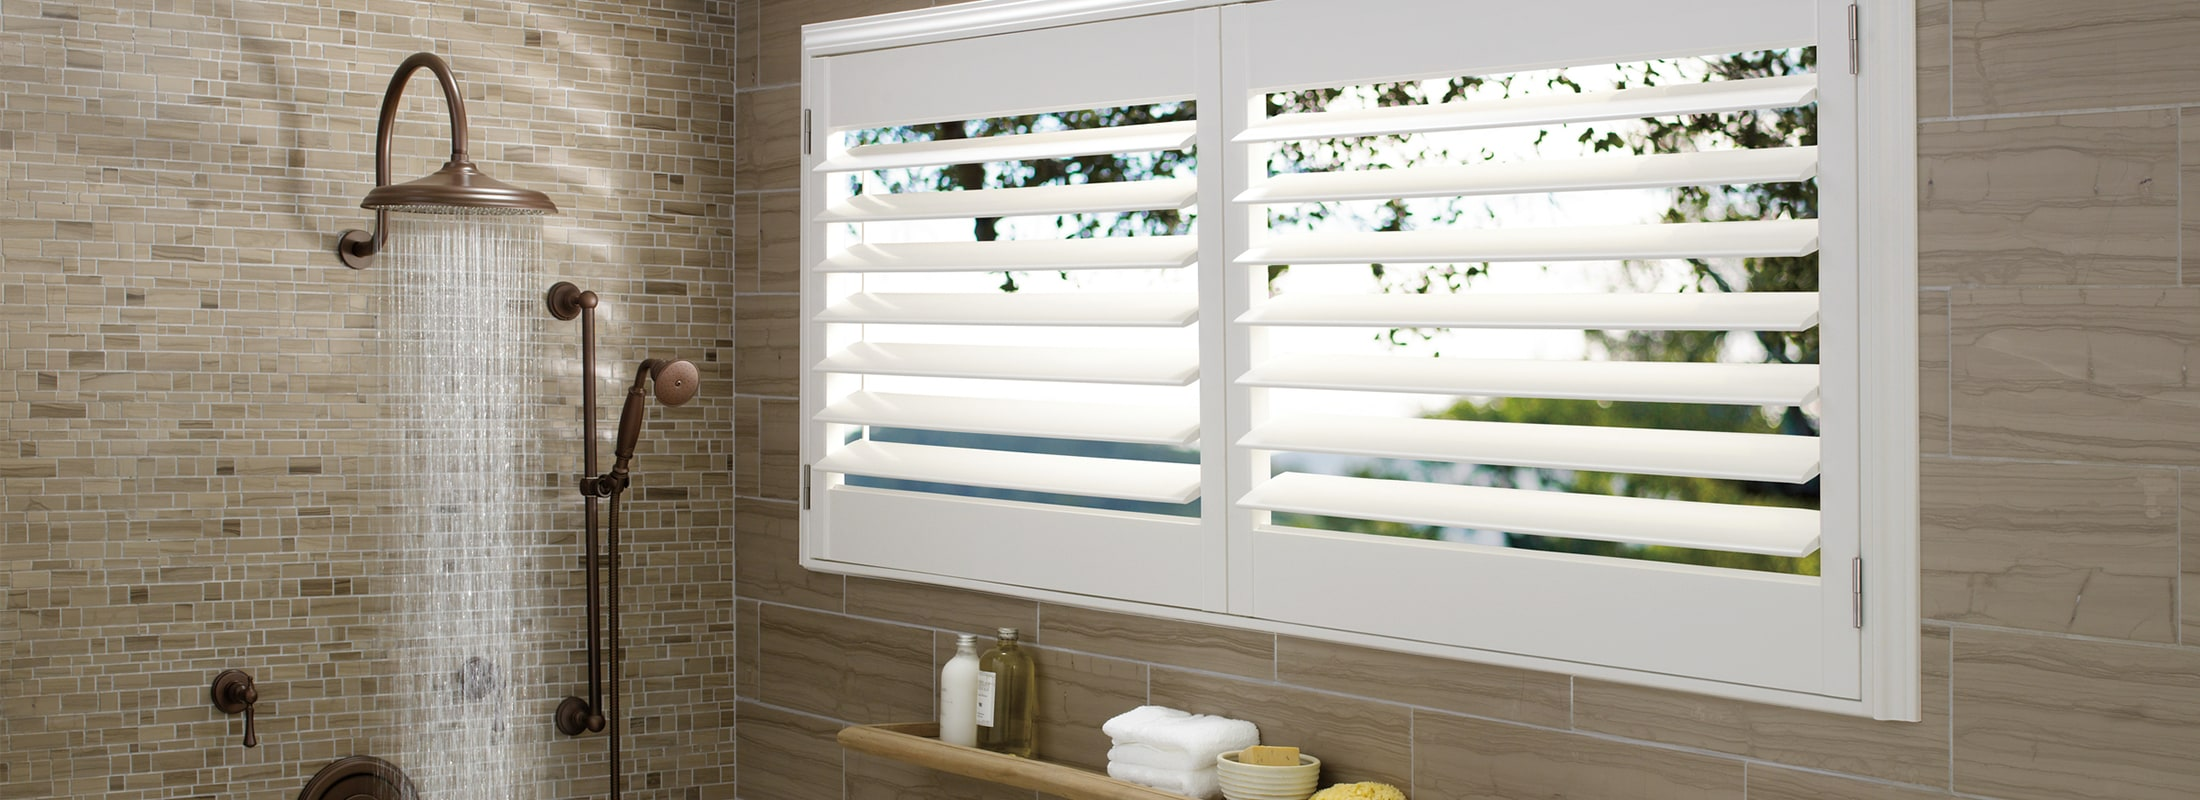 Indoor shutters in Polysatin™ Bright White - Palm Beach